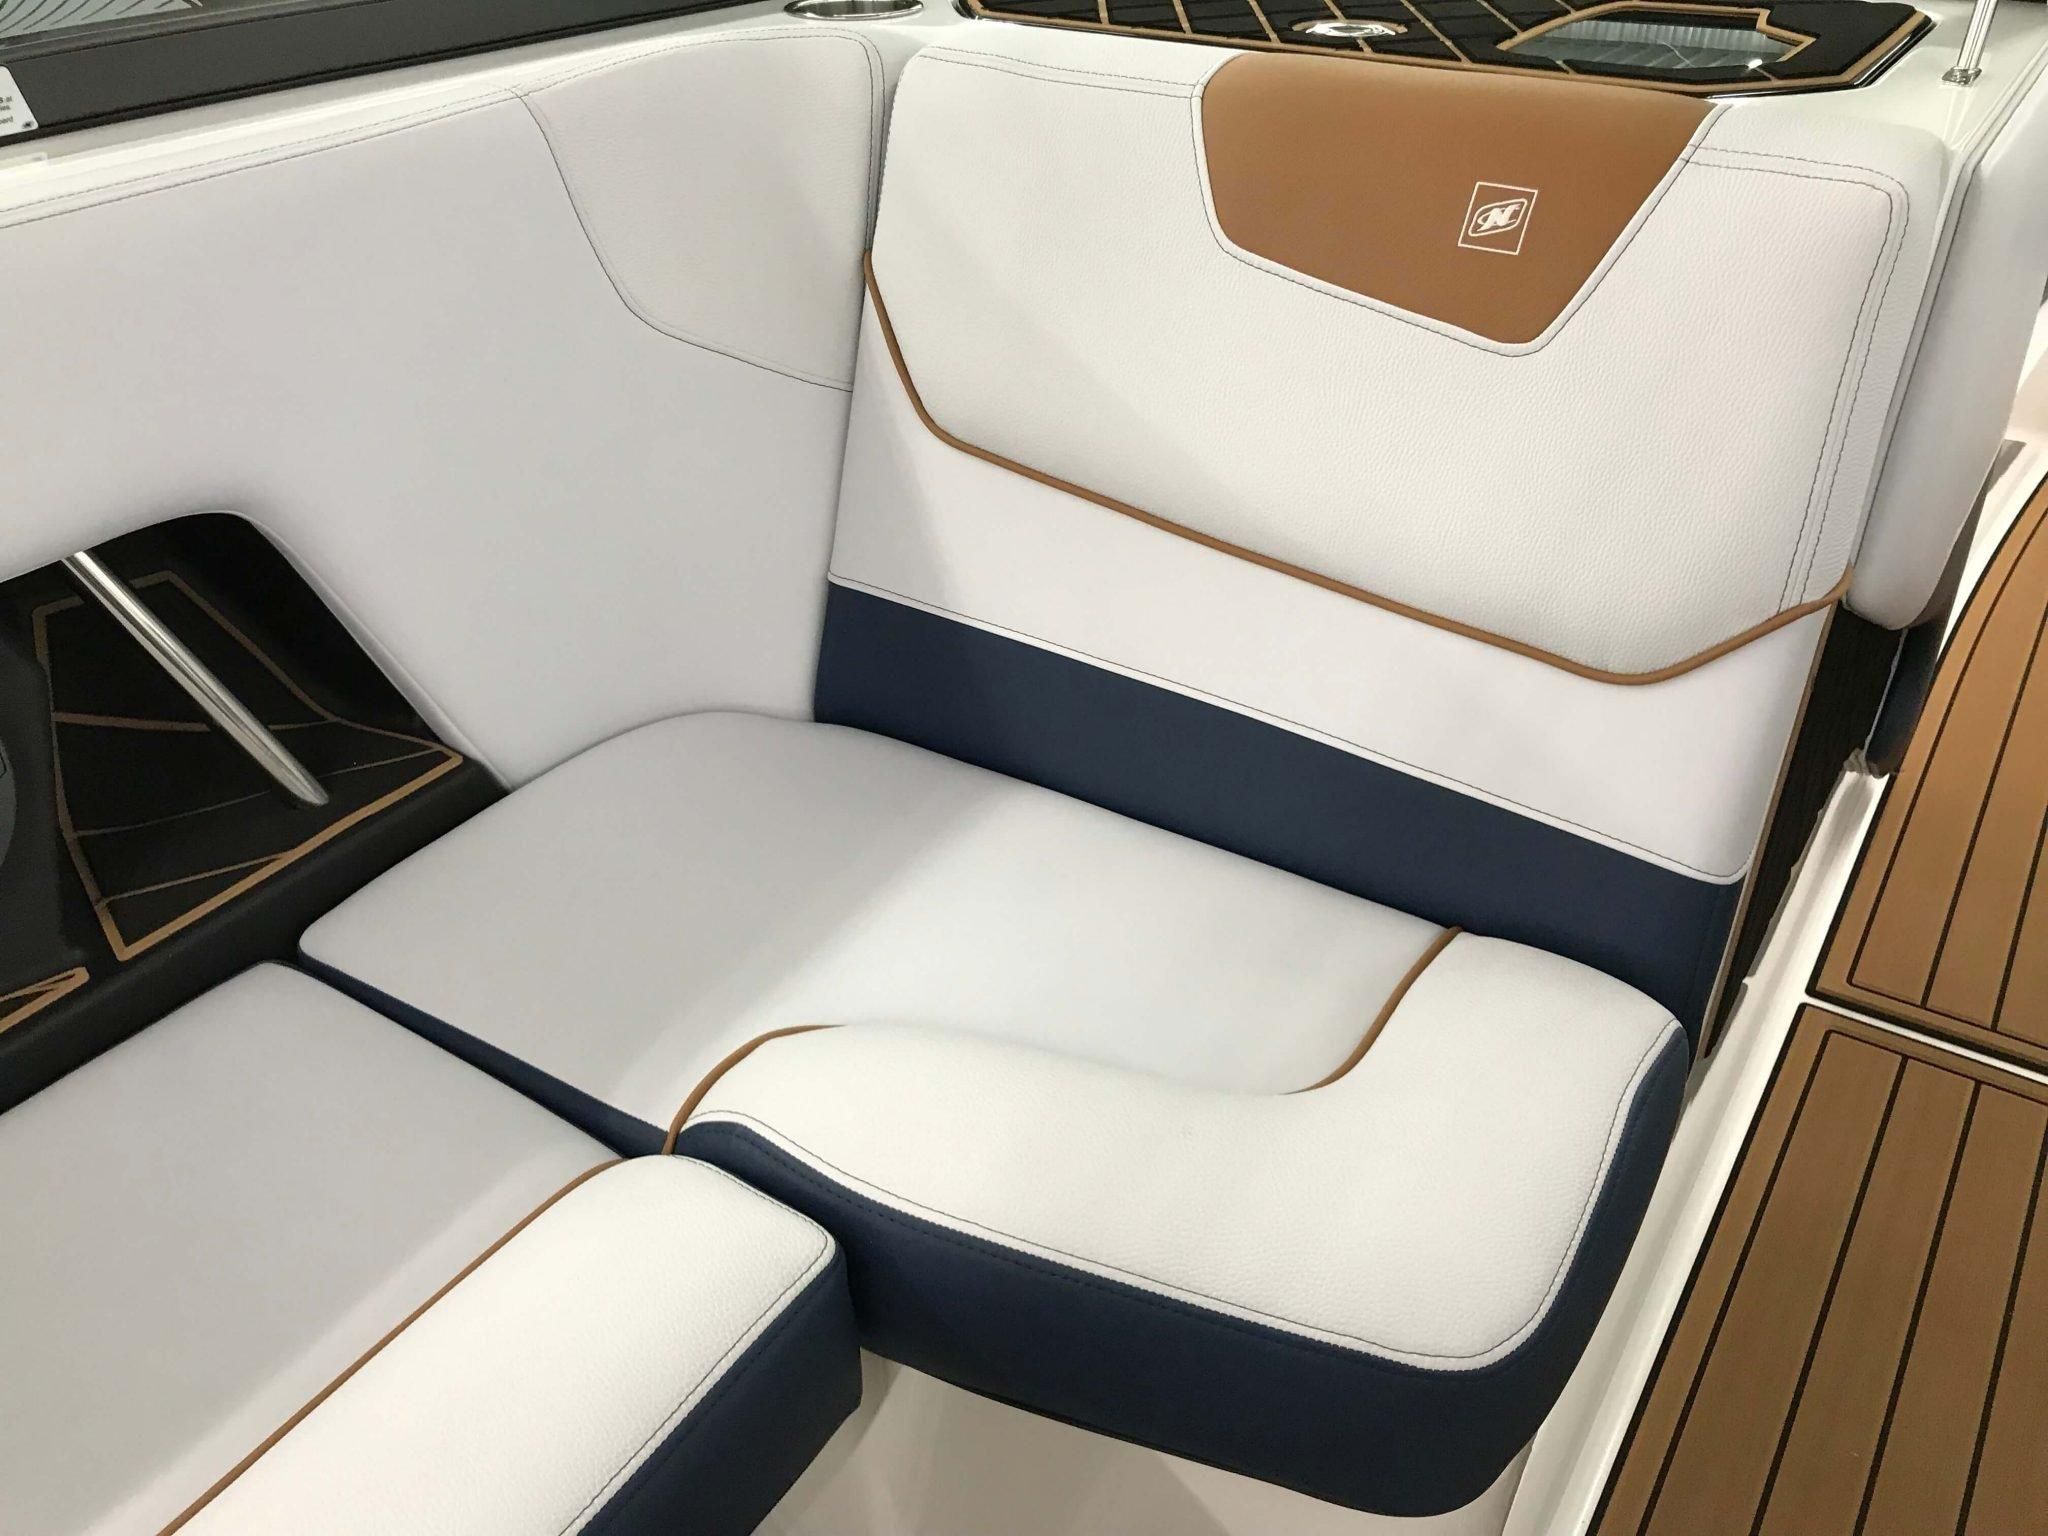 2019 Nautique GS22 Observer Seat 2